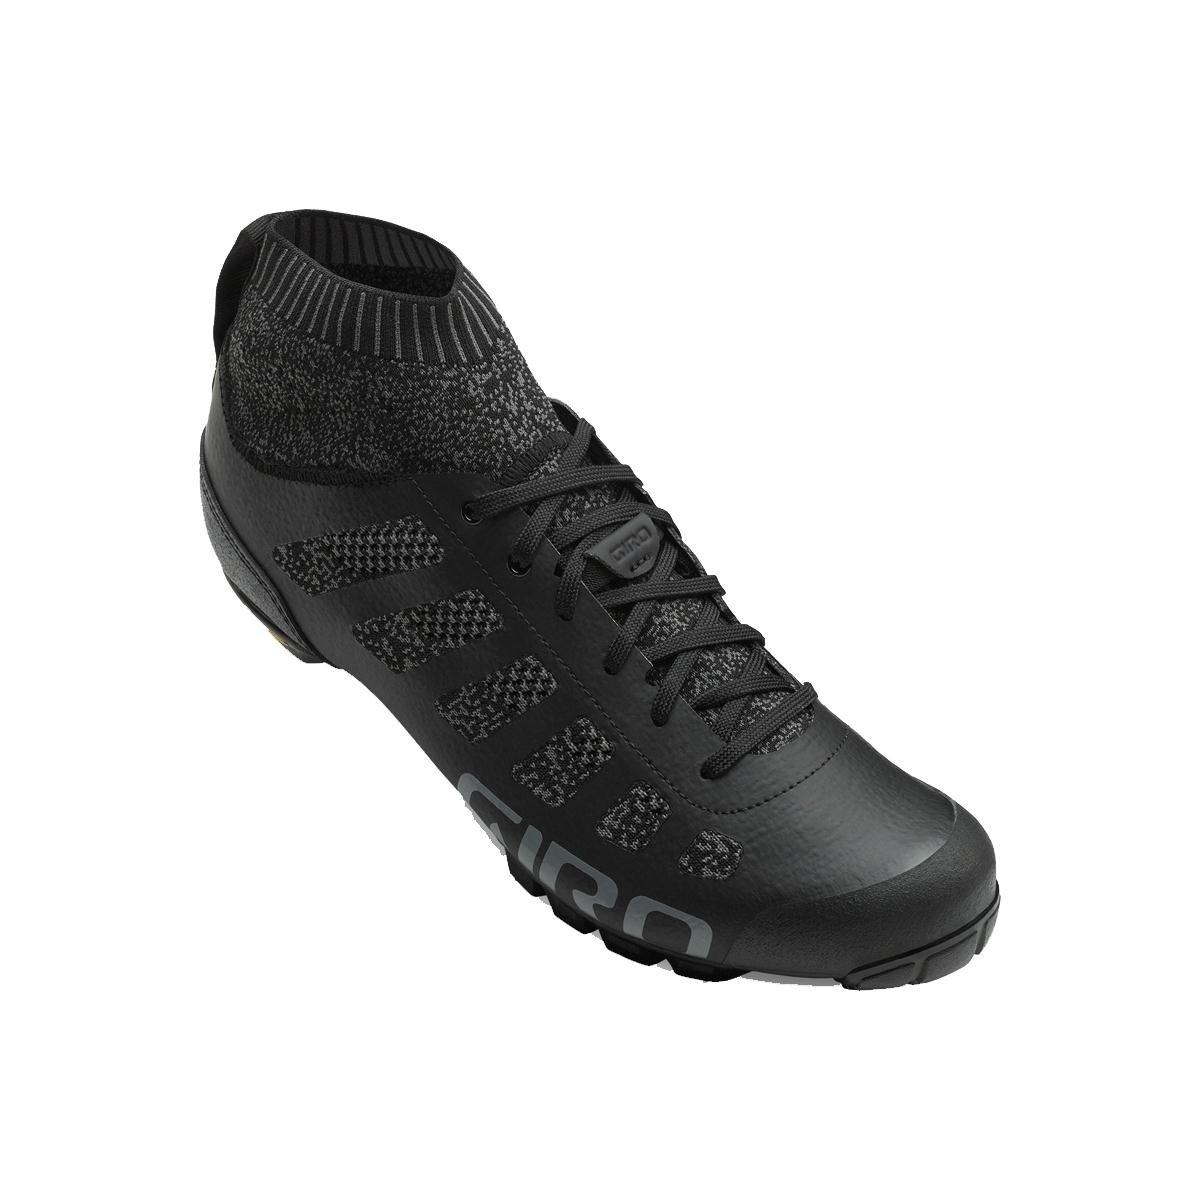 Giro Empire vr70ニットサイクリング靴 – Men 's 46 M EU ブラック/チャーコール B075RVZQQX